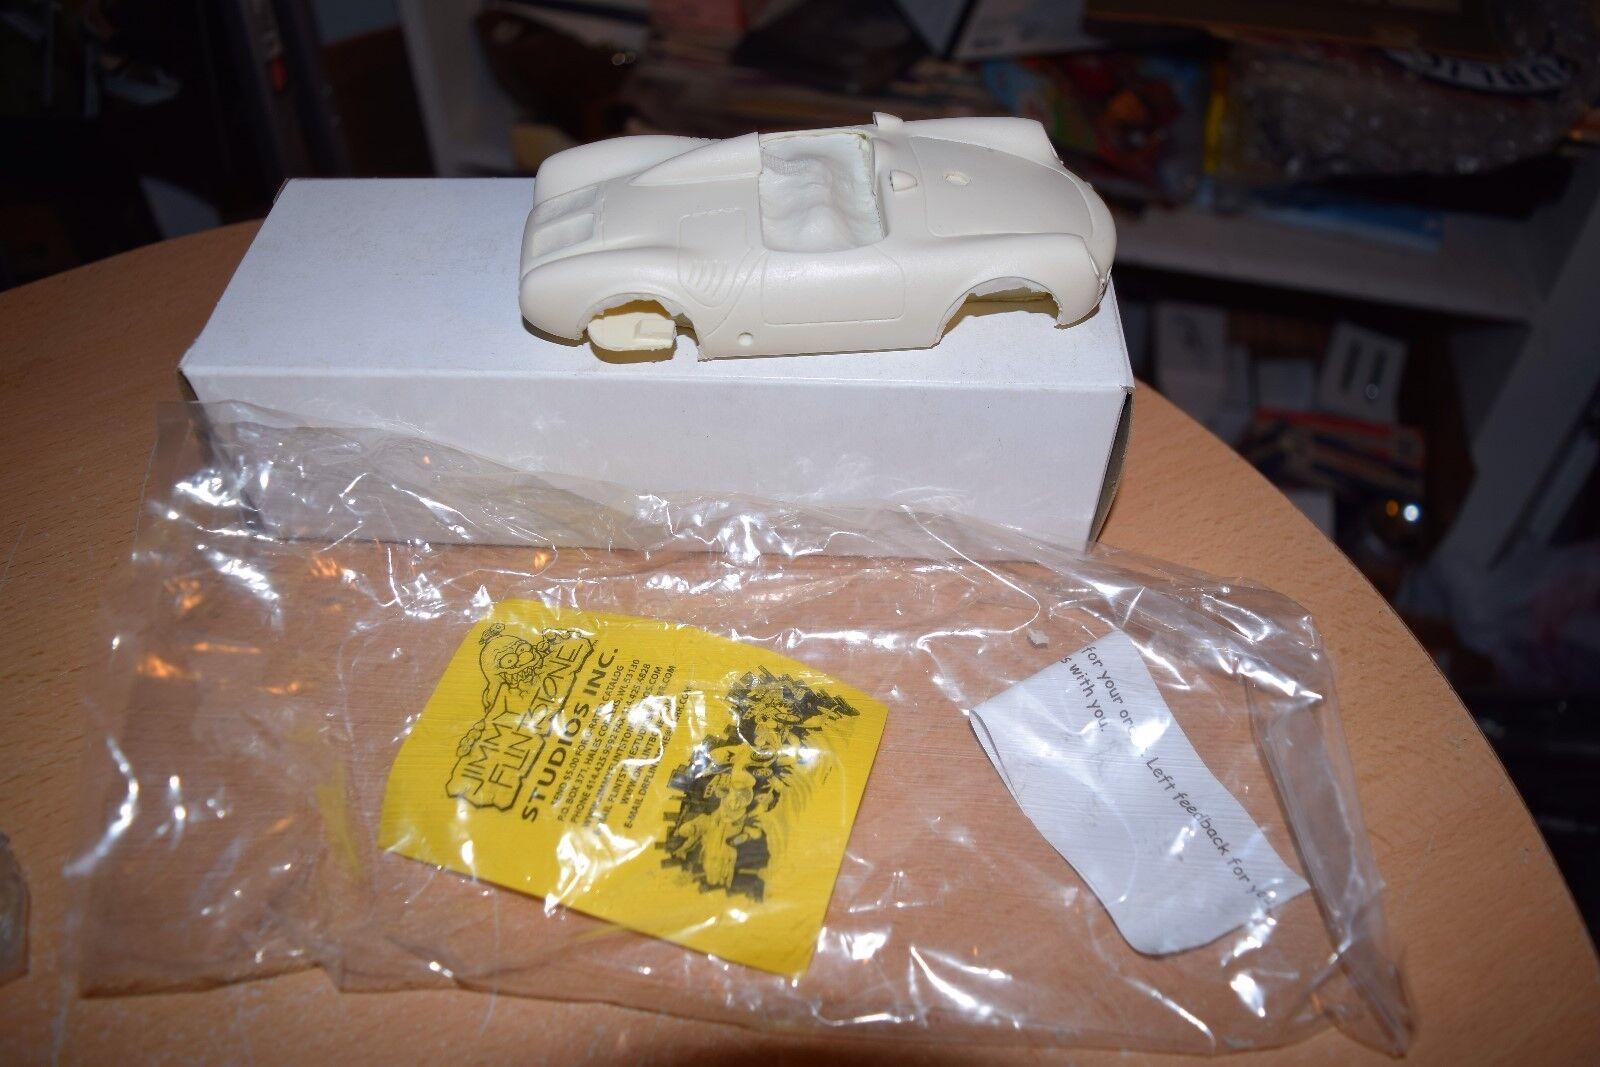 Jimmy flintstone harz kit studebaker lustig auto body & bulletnose new in box